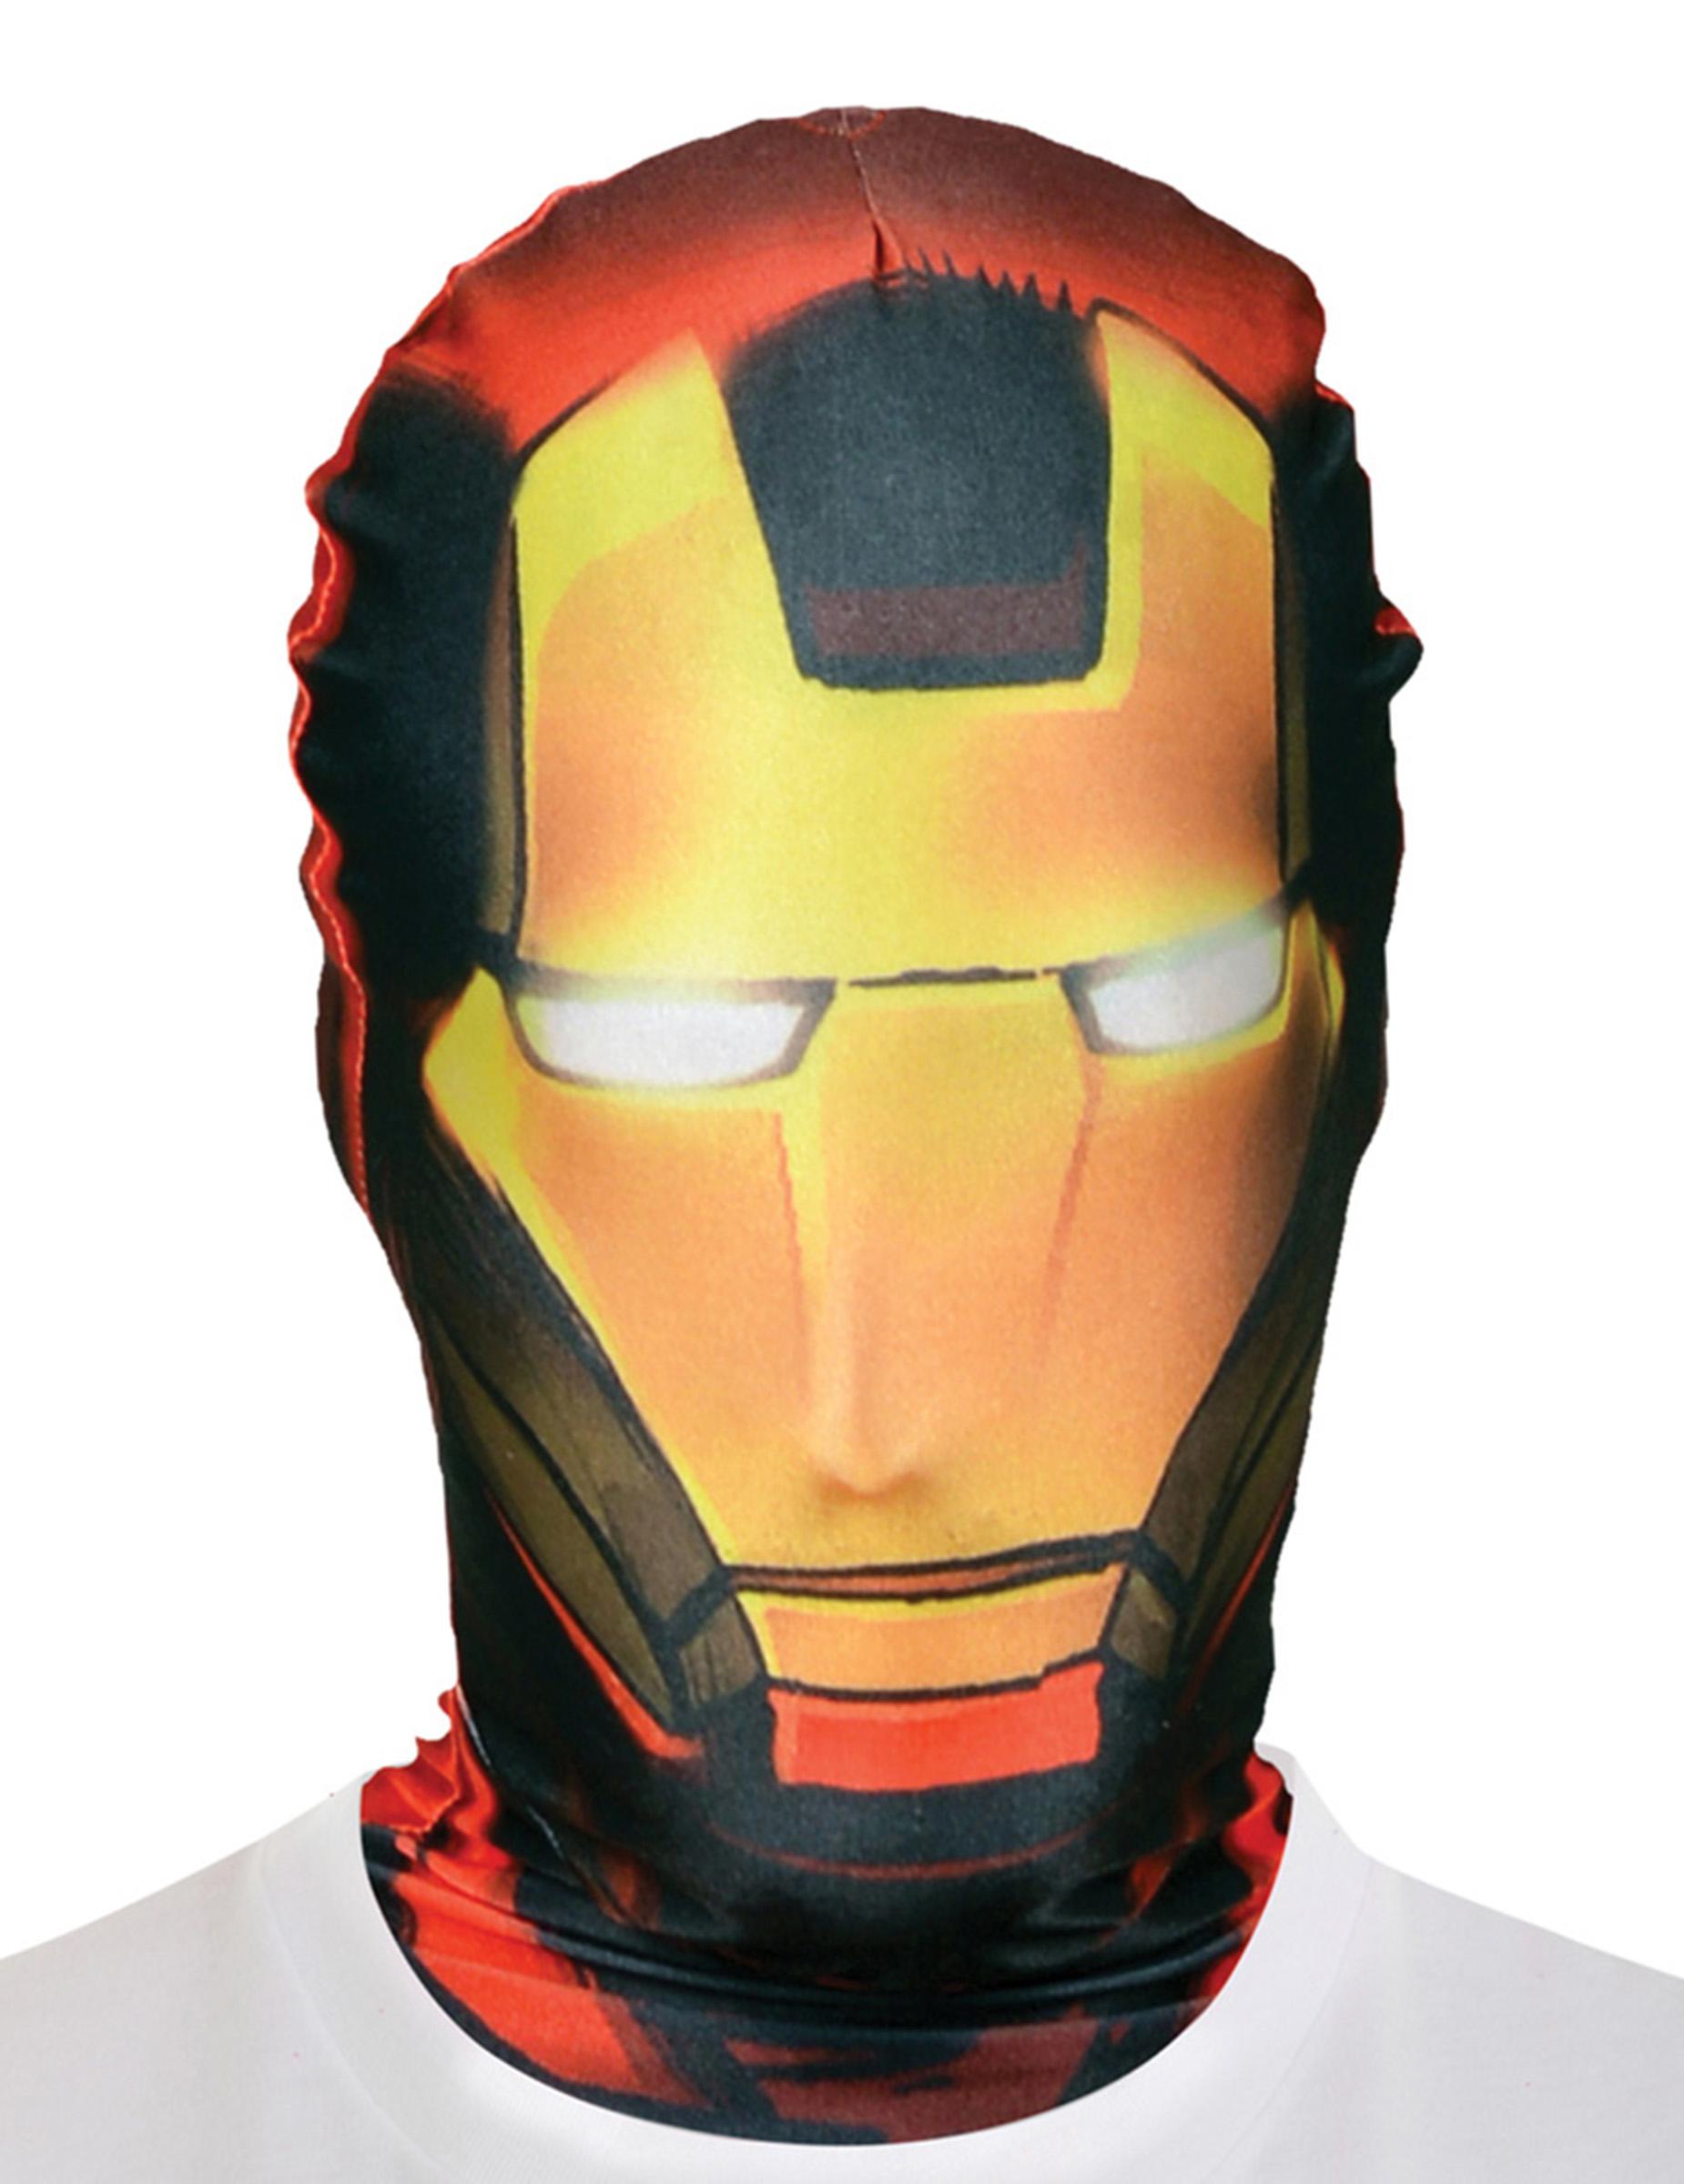 cagoule iron man adulte morphsuits deguise toi achat de masques. Black Bedroom Furniture Sets. Home Design Ideas